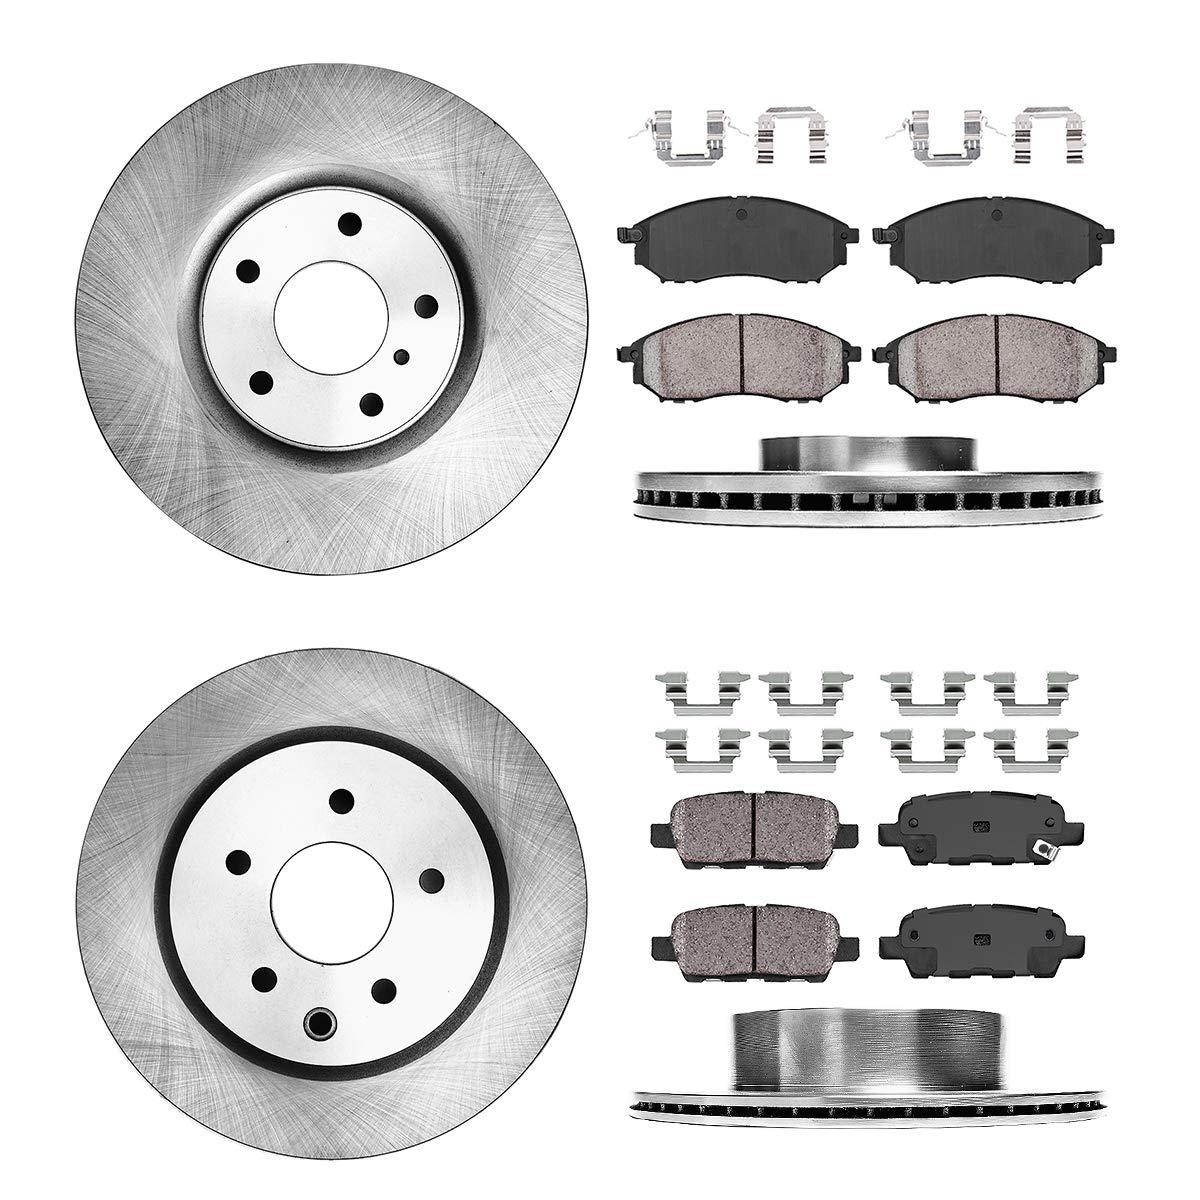 4 Brake Disc Rotors + Hardware 2 FRONT 320 mm Premium OE 5 Lug Ceramic Brake Pads